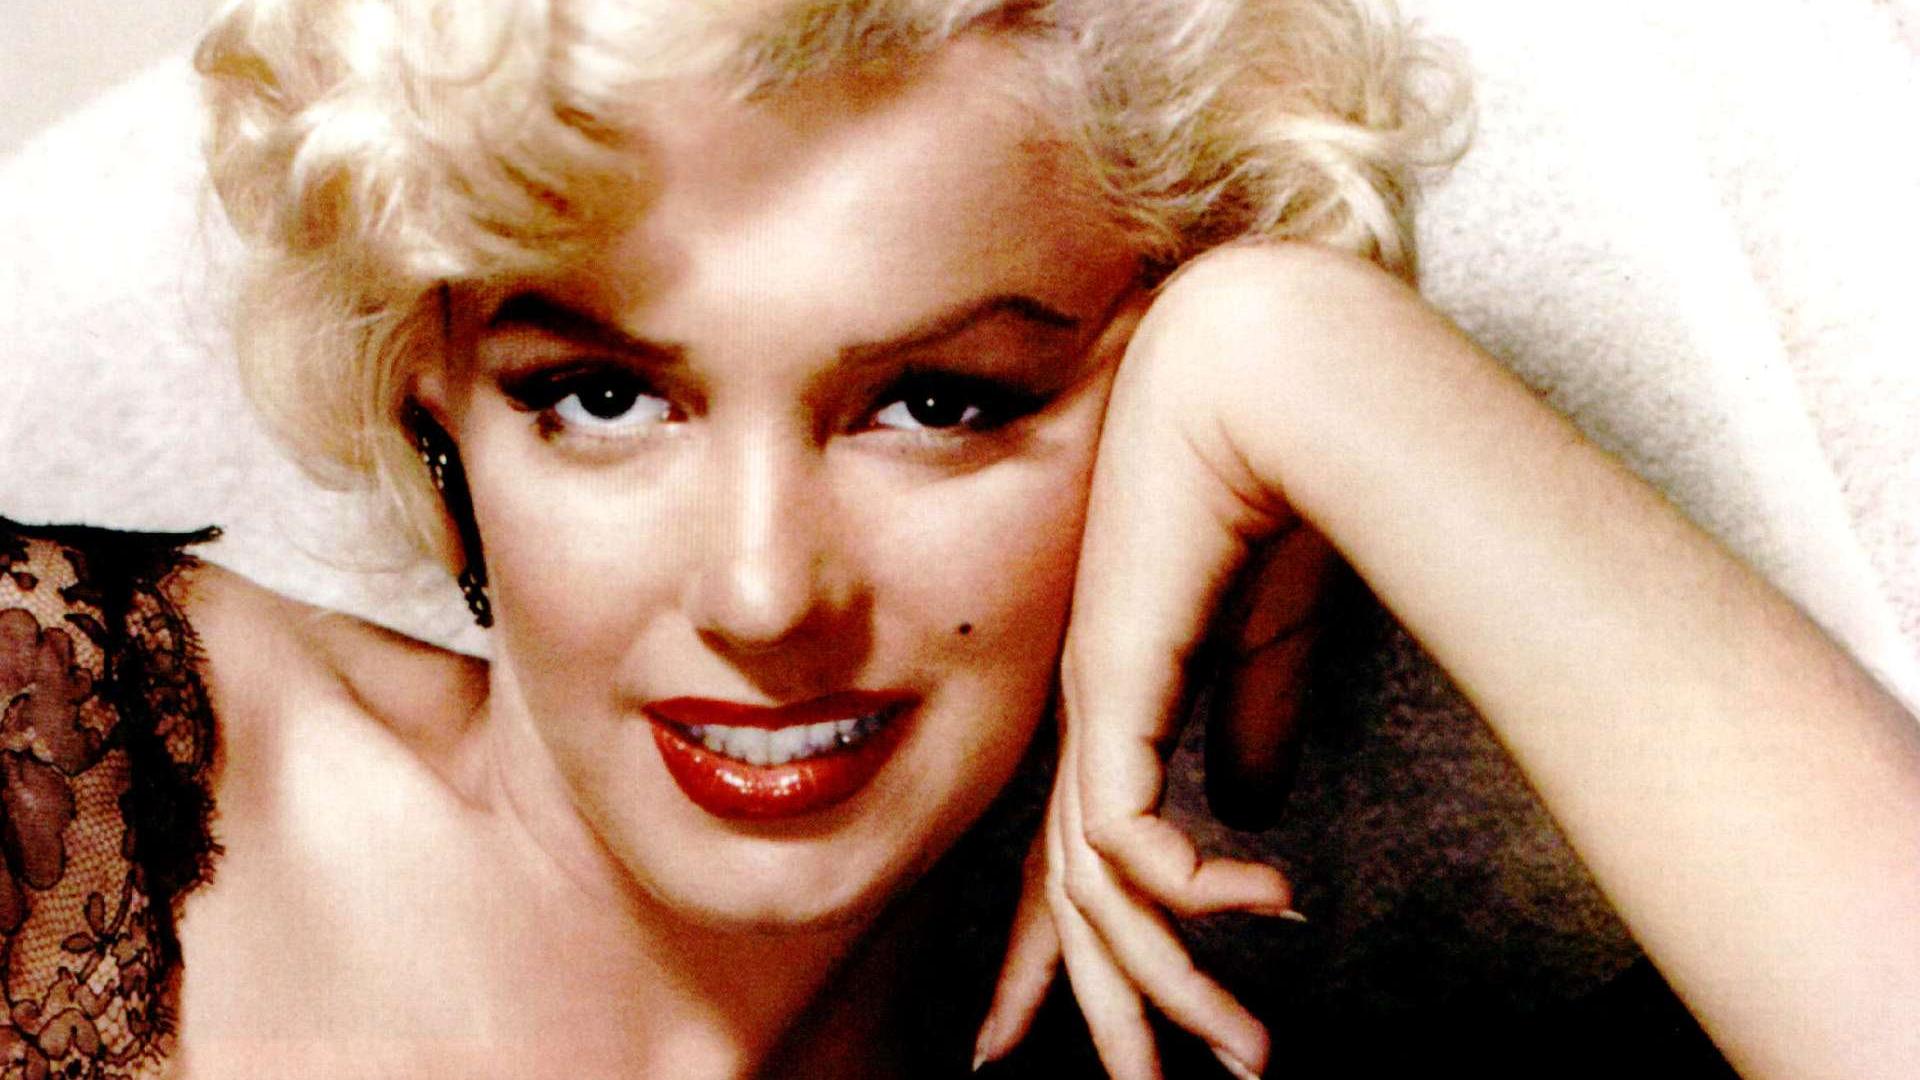 Free Download Marilyn Monroe Wallpaper For Bedroom Walls 1